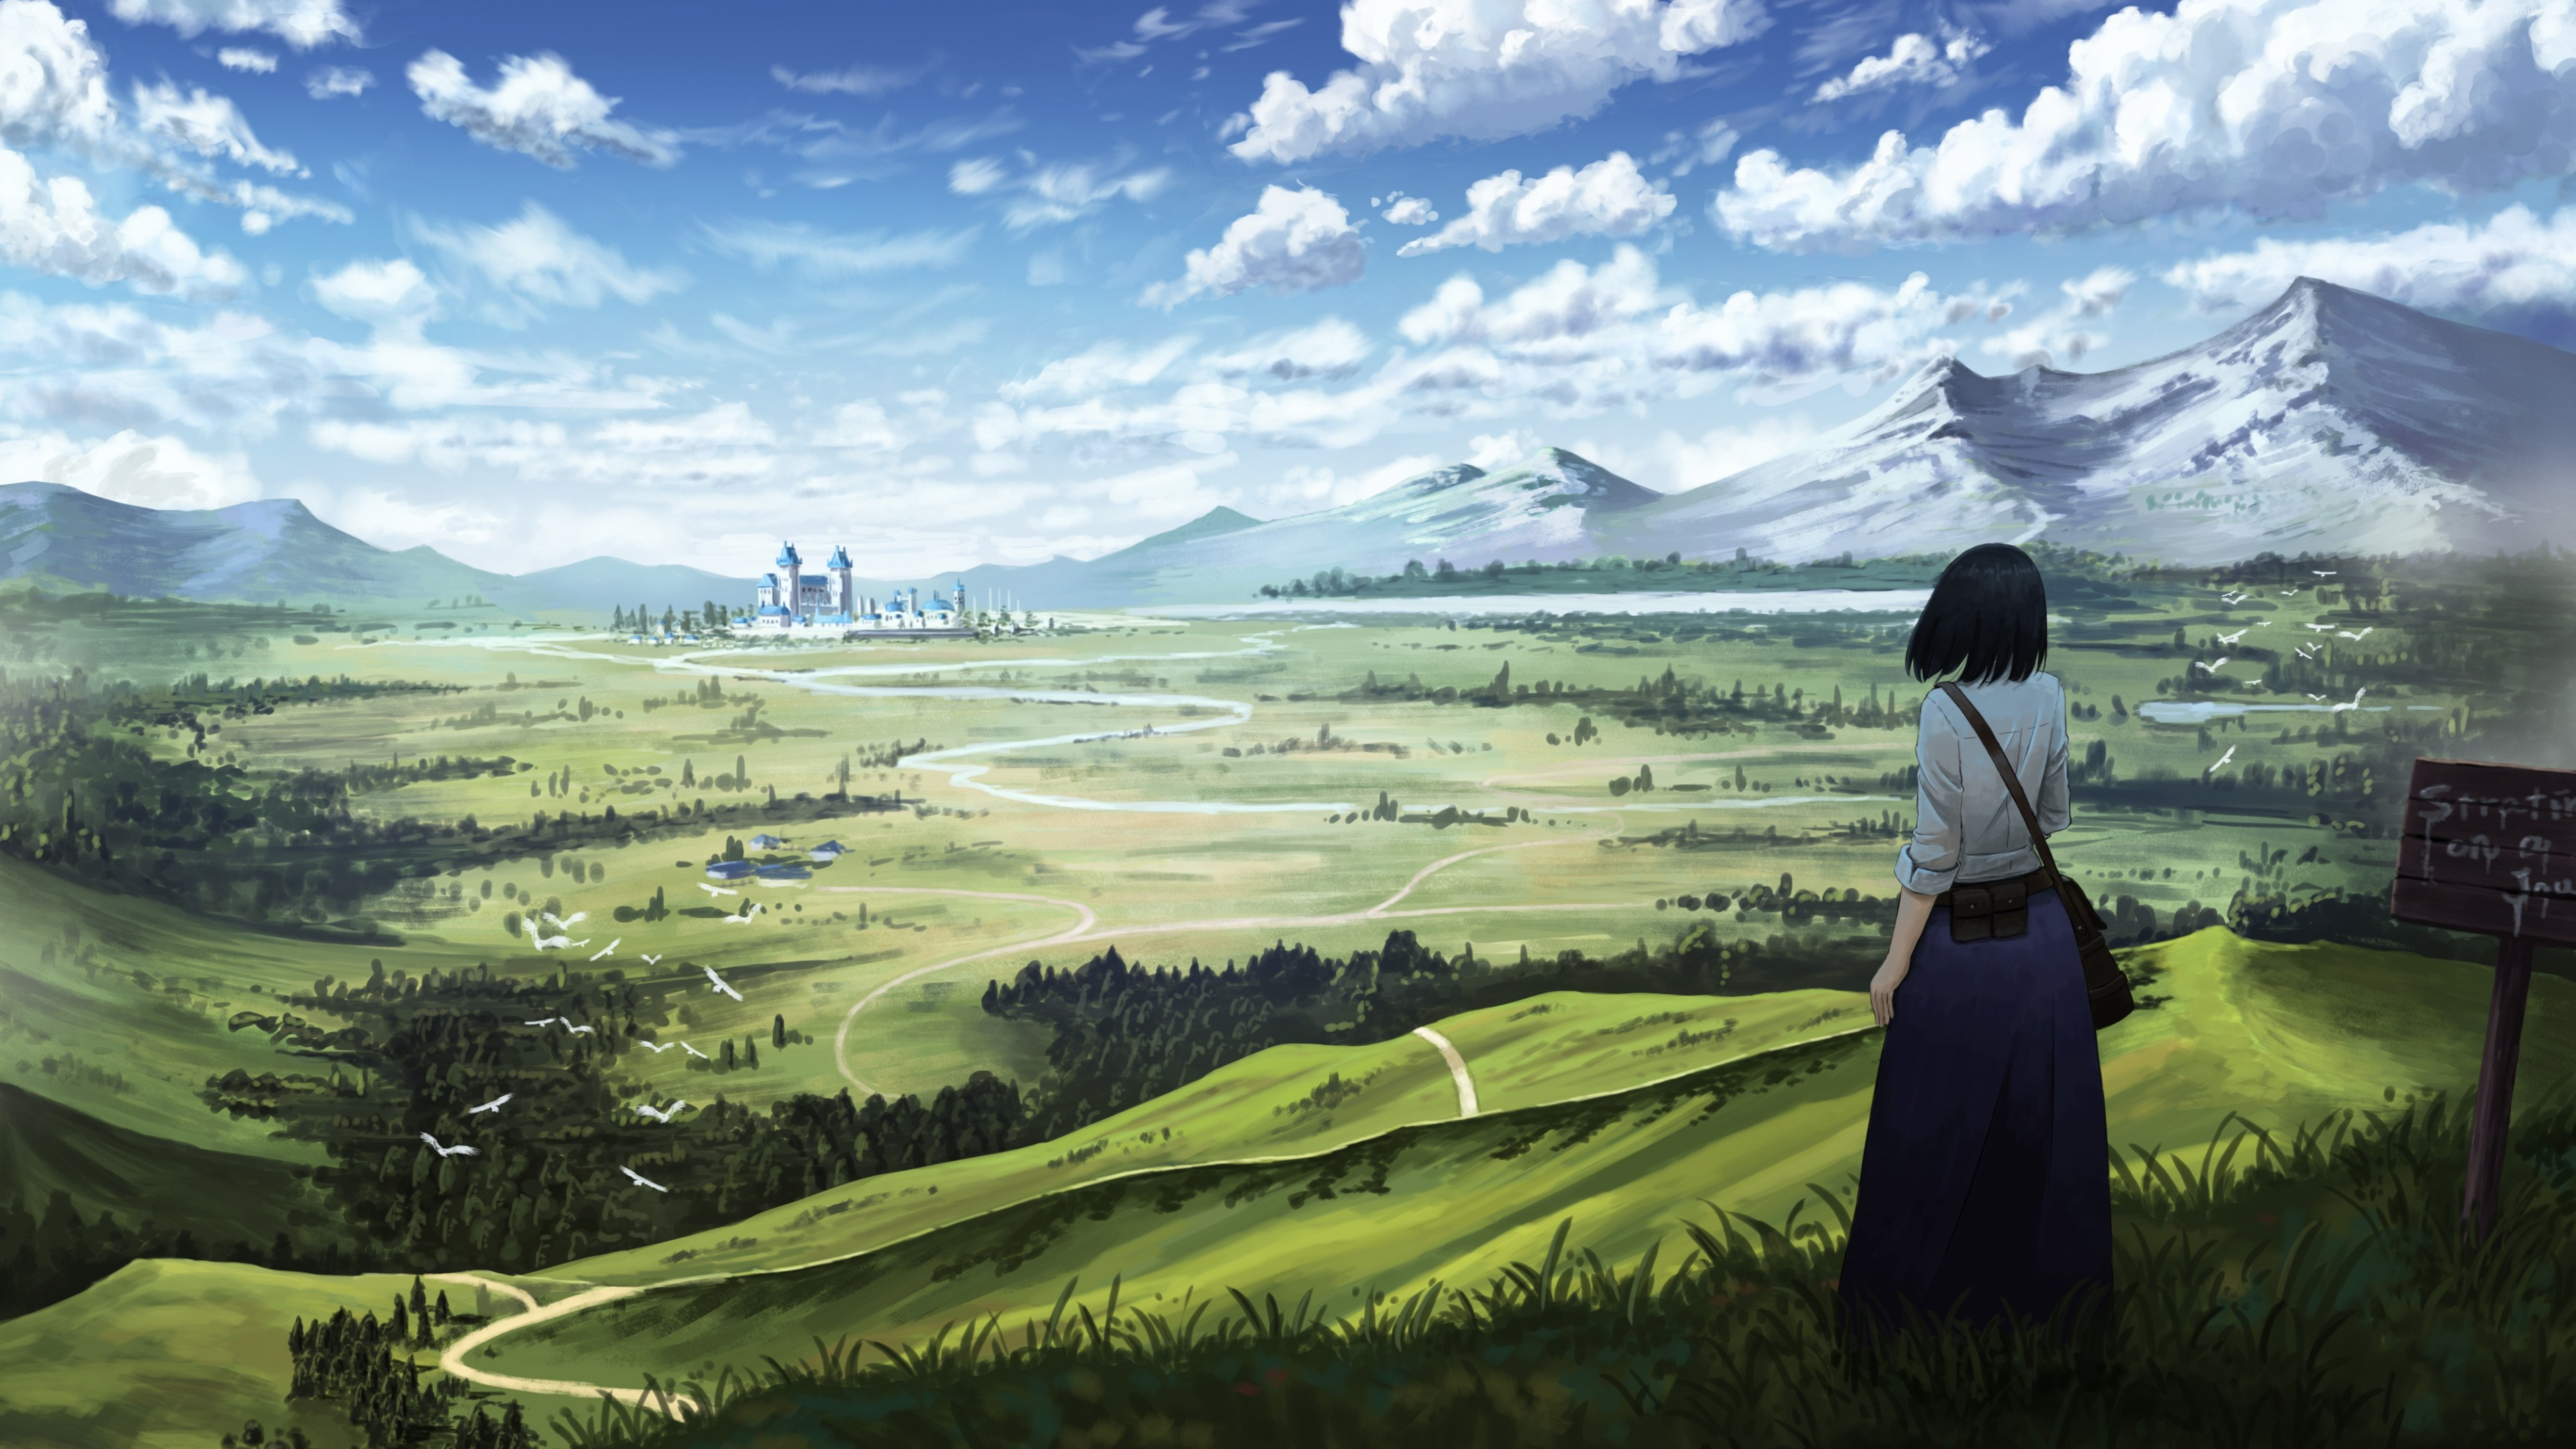 Castle in the distance anime landscape wallpaper